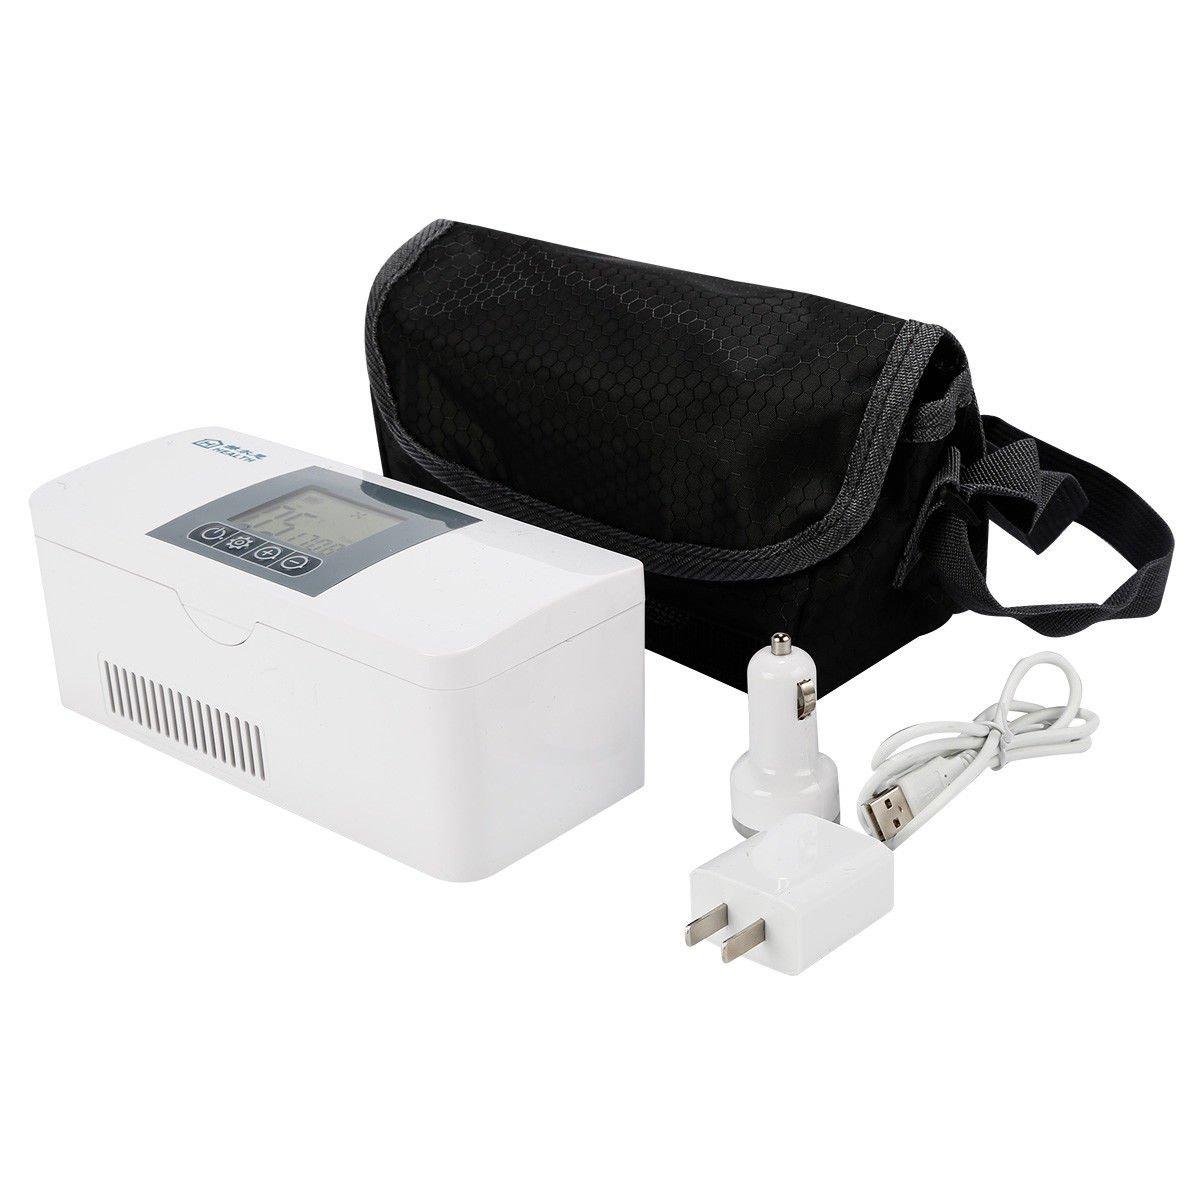 TC-Home Portable Travel Medicine Freezer Mini Fridge Case Diabetic Insulin Cooler Box Car Refrigerator 2-8 ℃